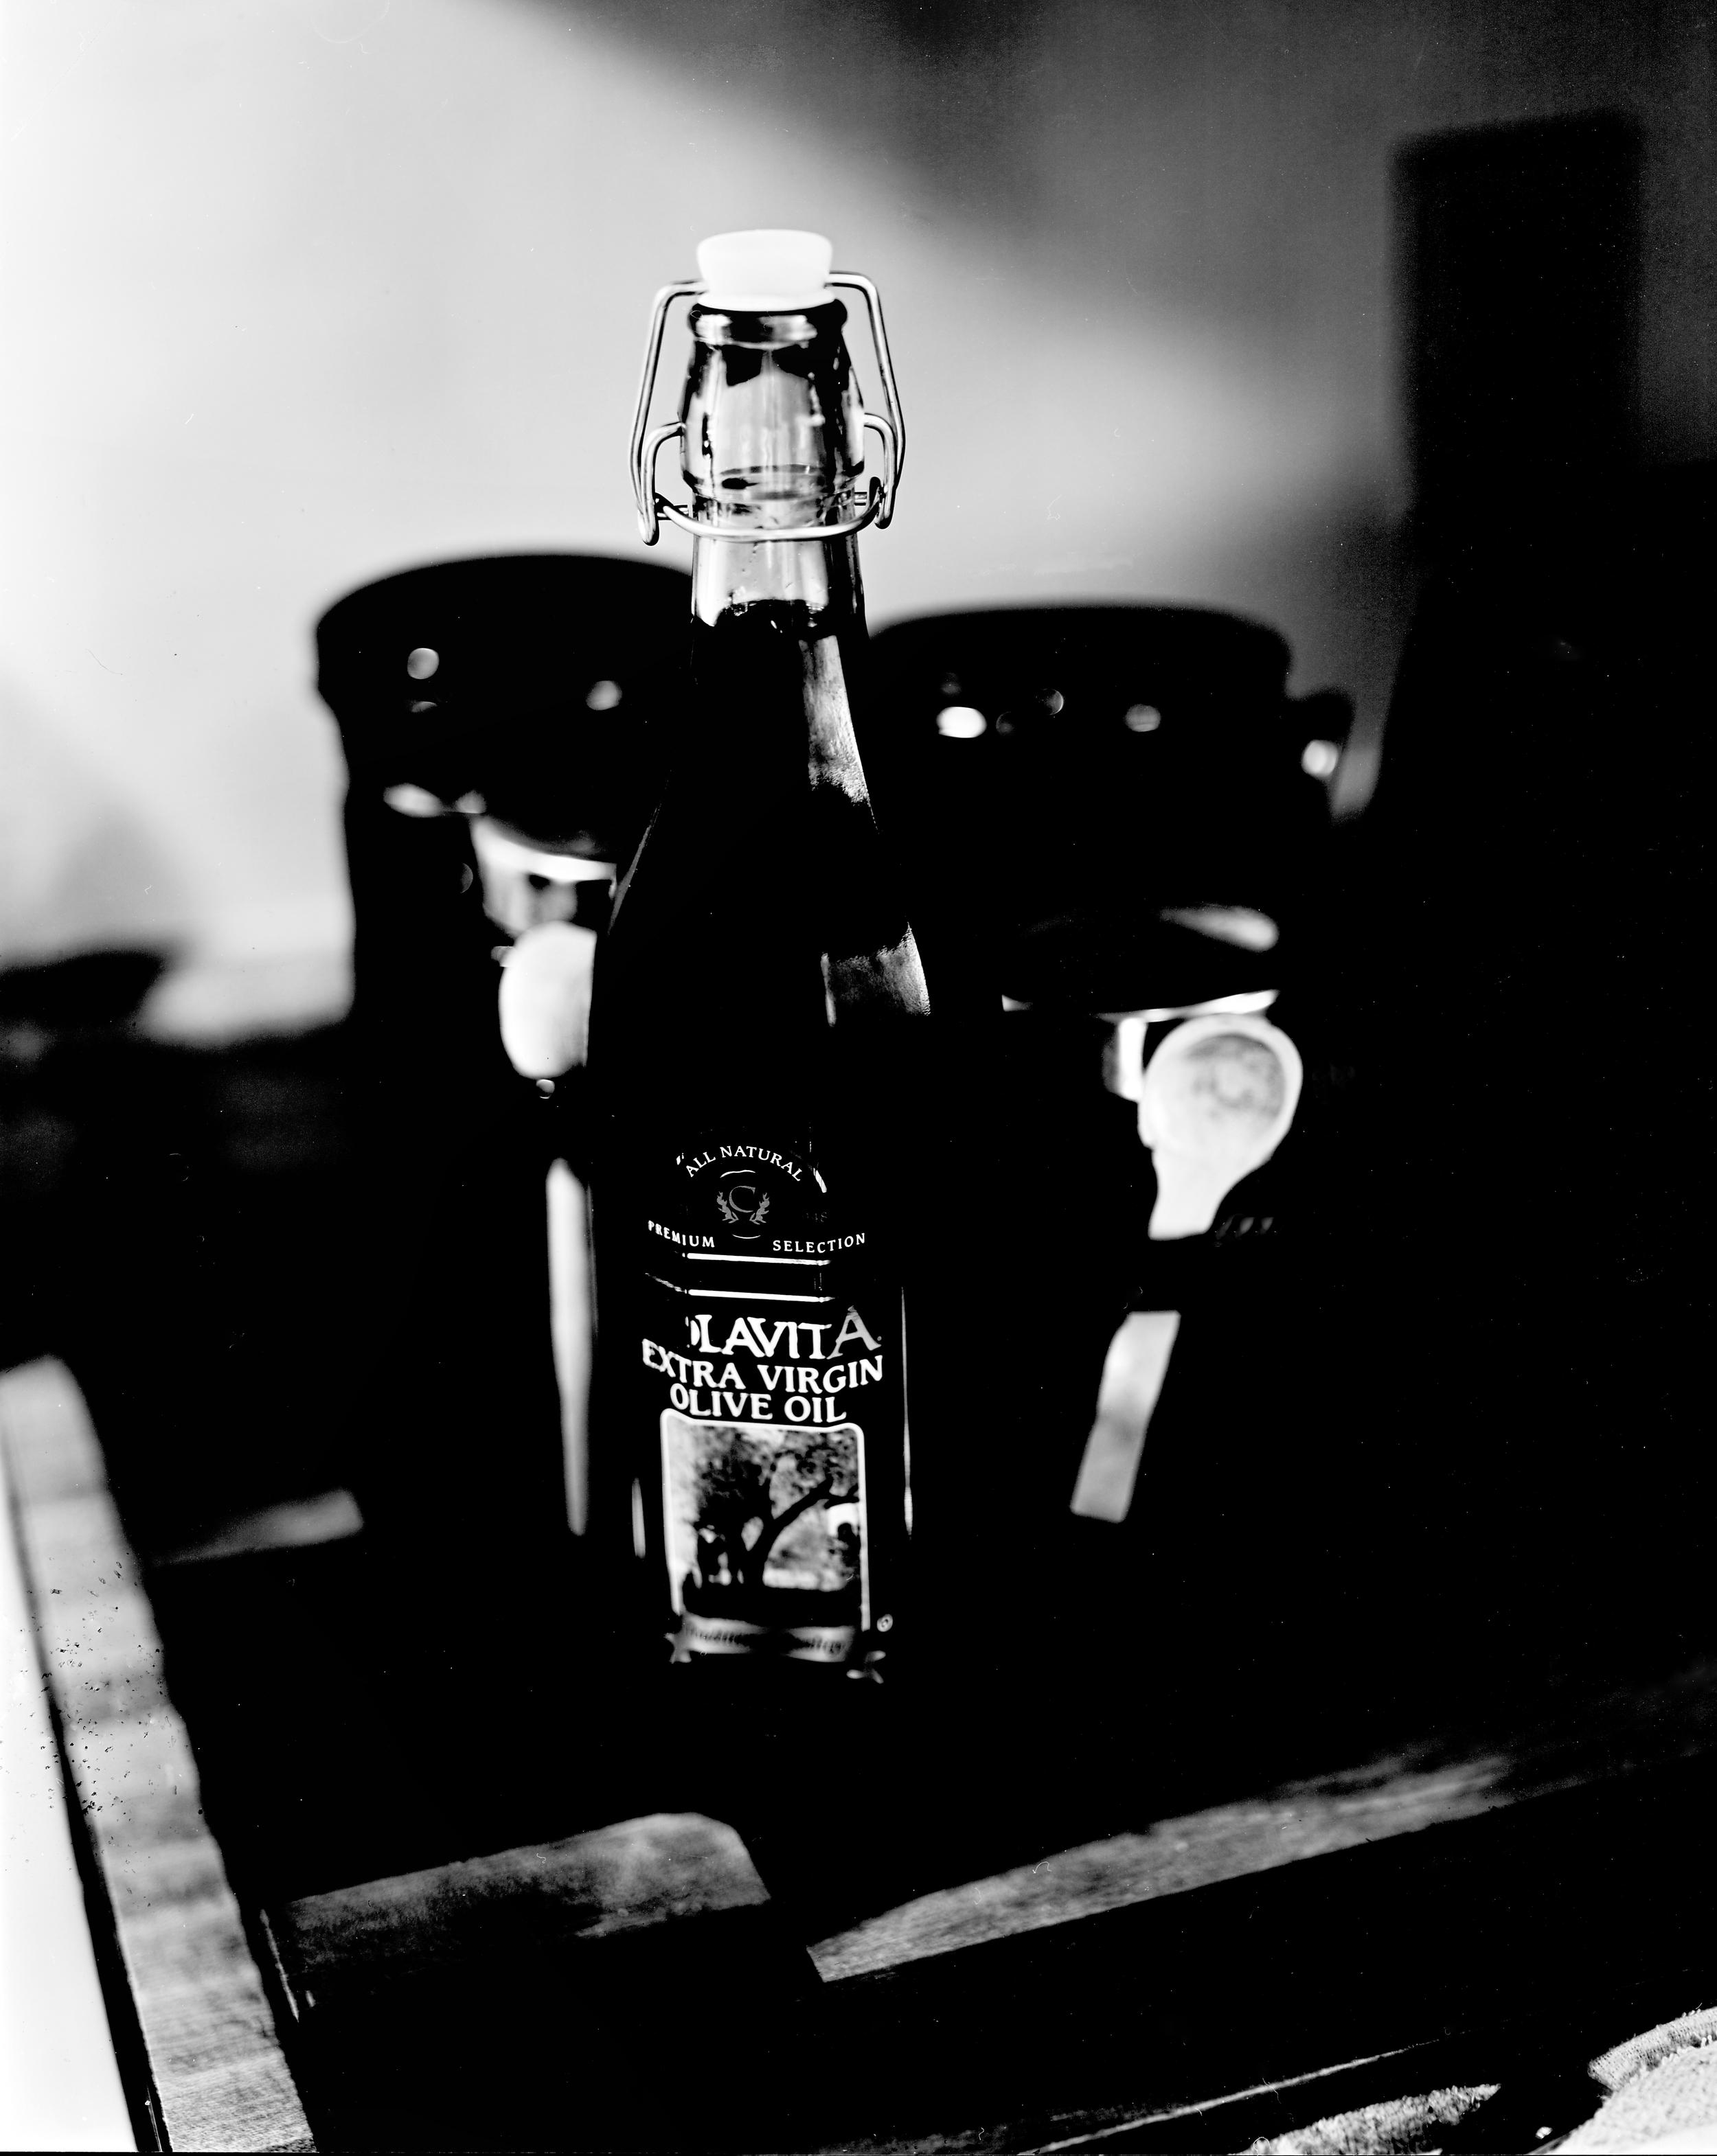 Bobby Kulik | Olive Oil | B&J Press 4x5 Industar 210mm Ortho Litho